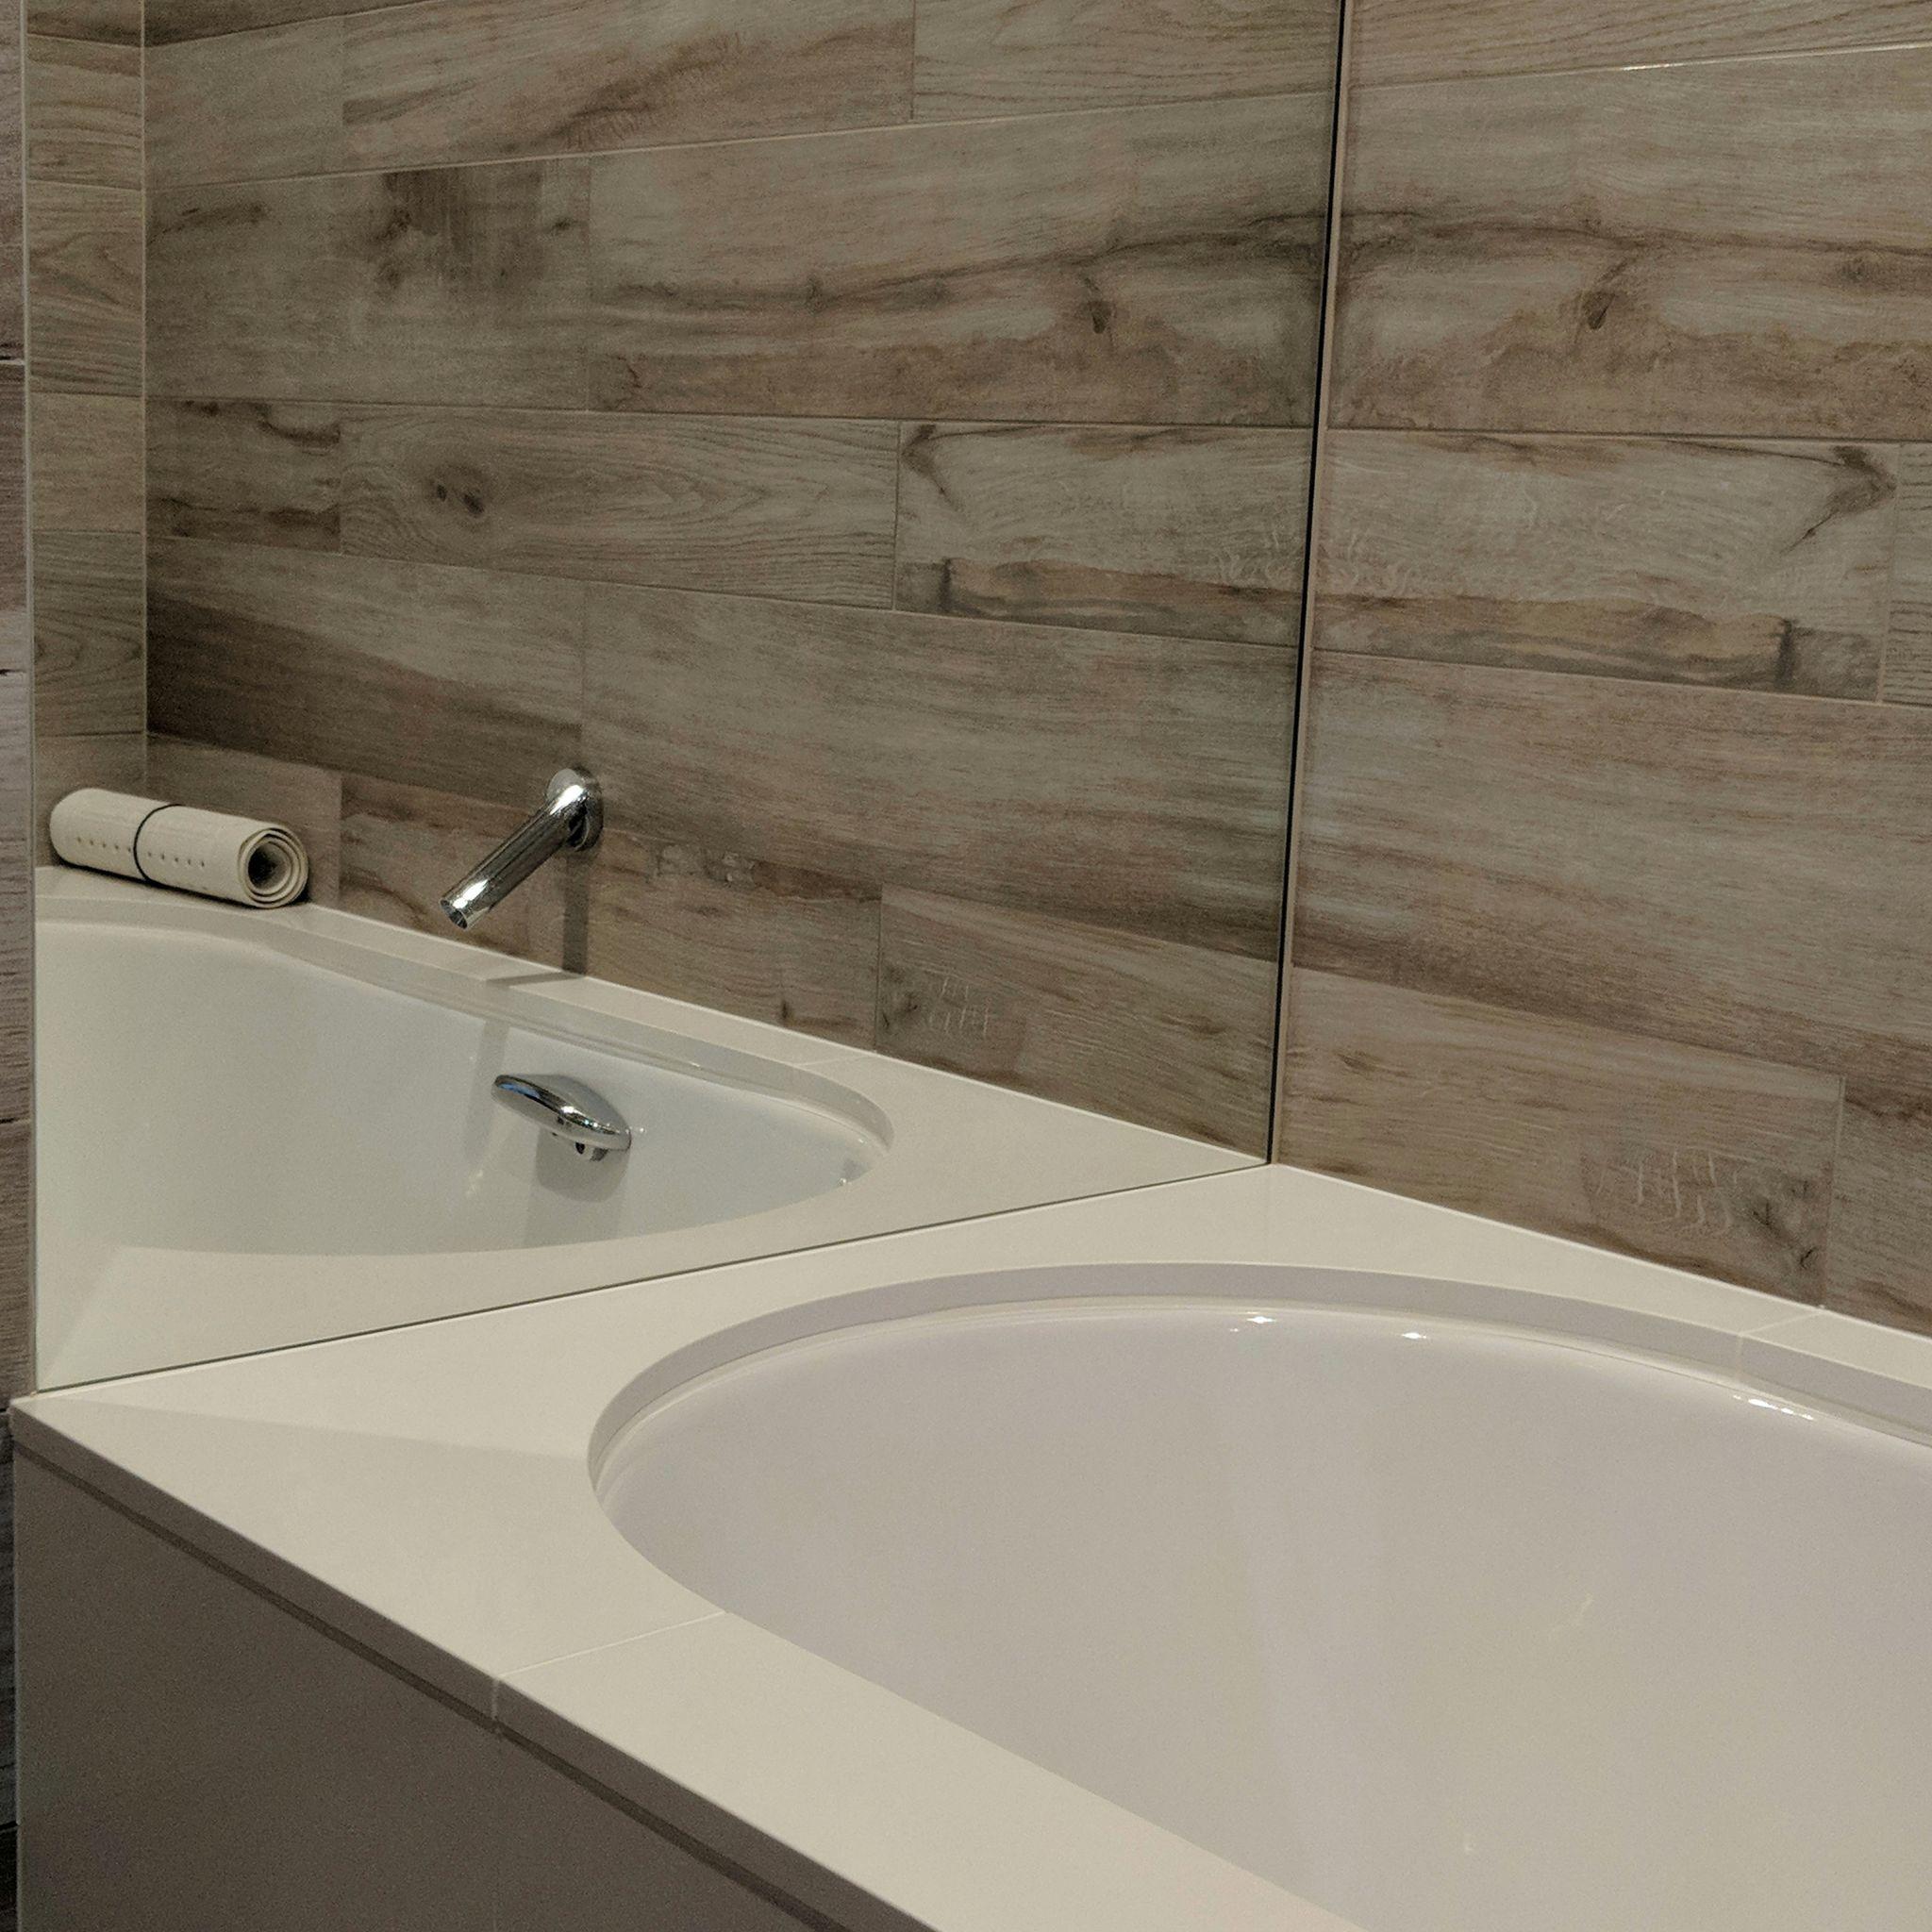 hyatt centric ginza tokyo king bed room bathroom bathtub